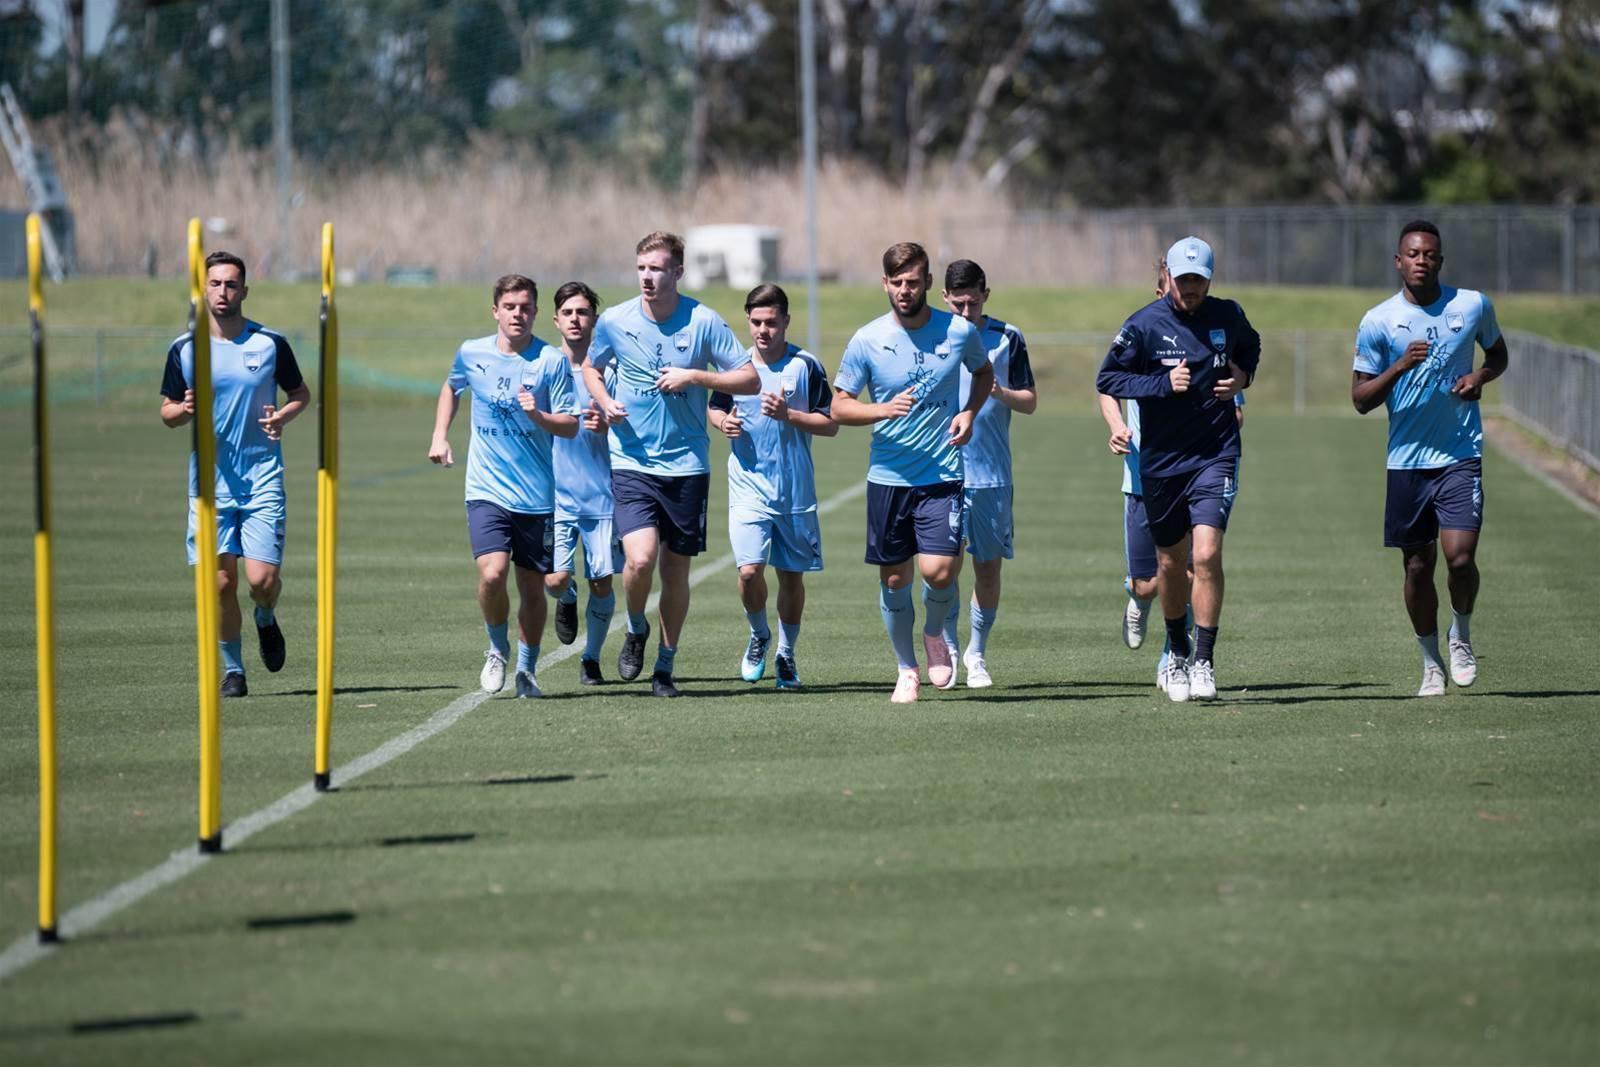 Pic Special: Sydney's next gen stars train